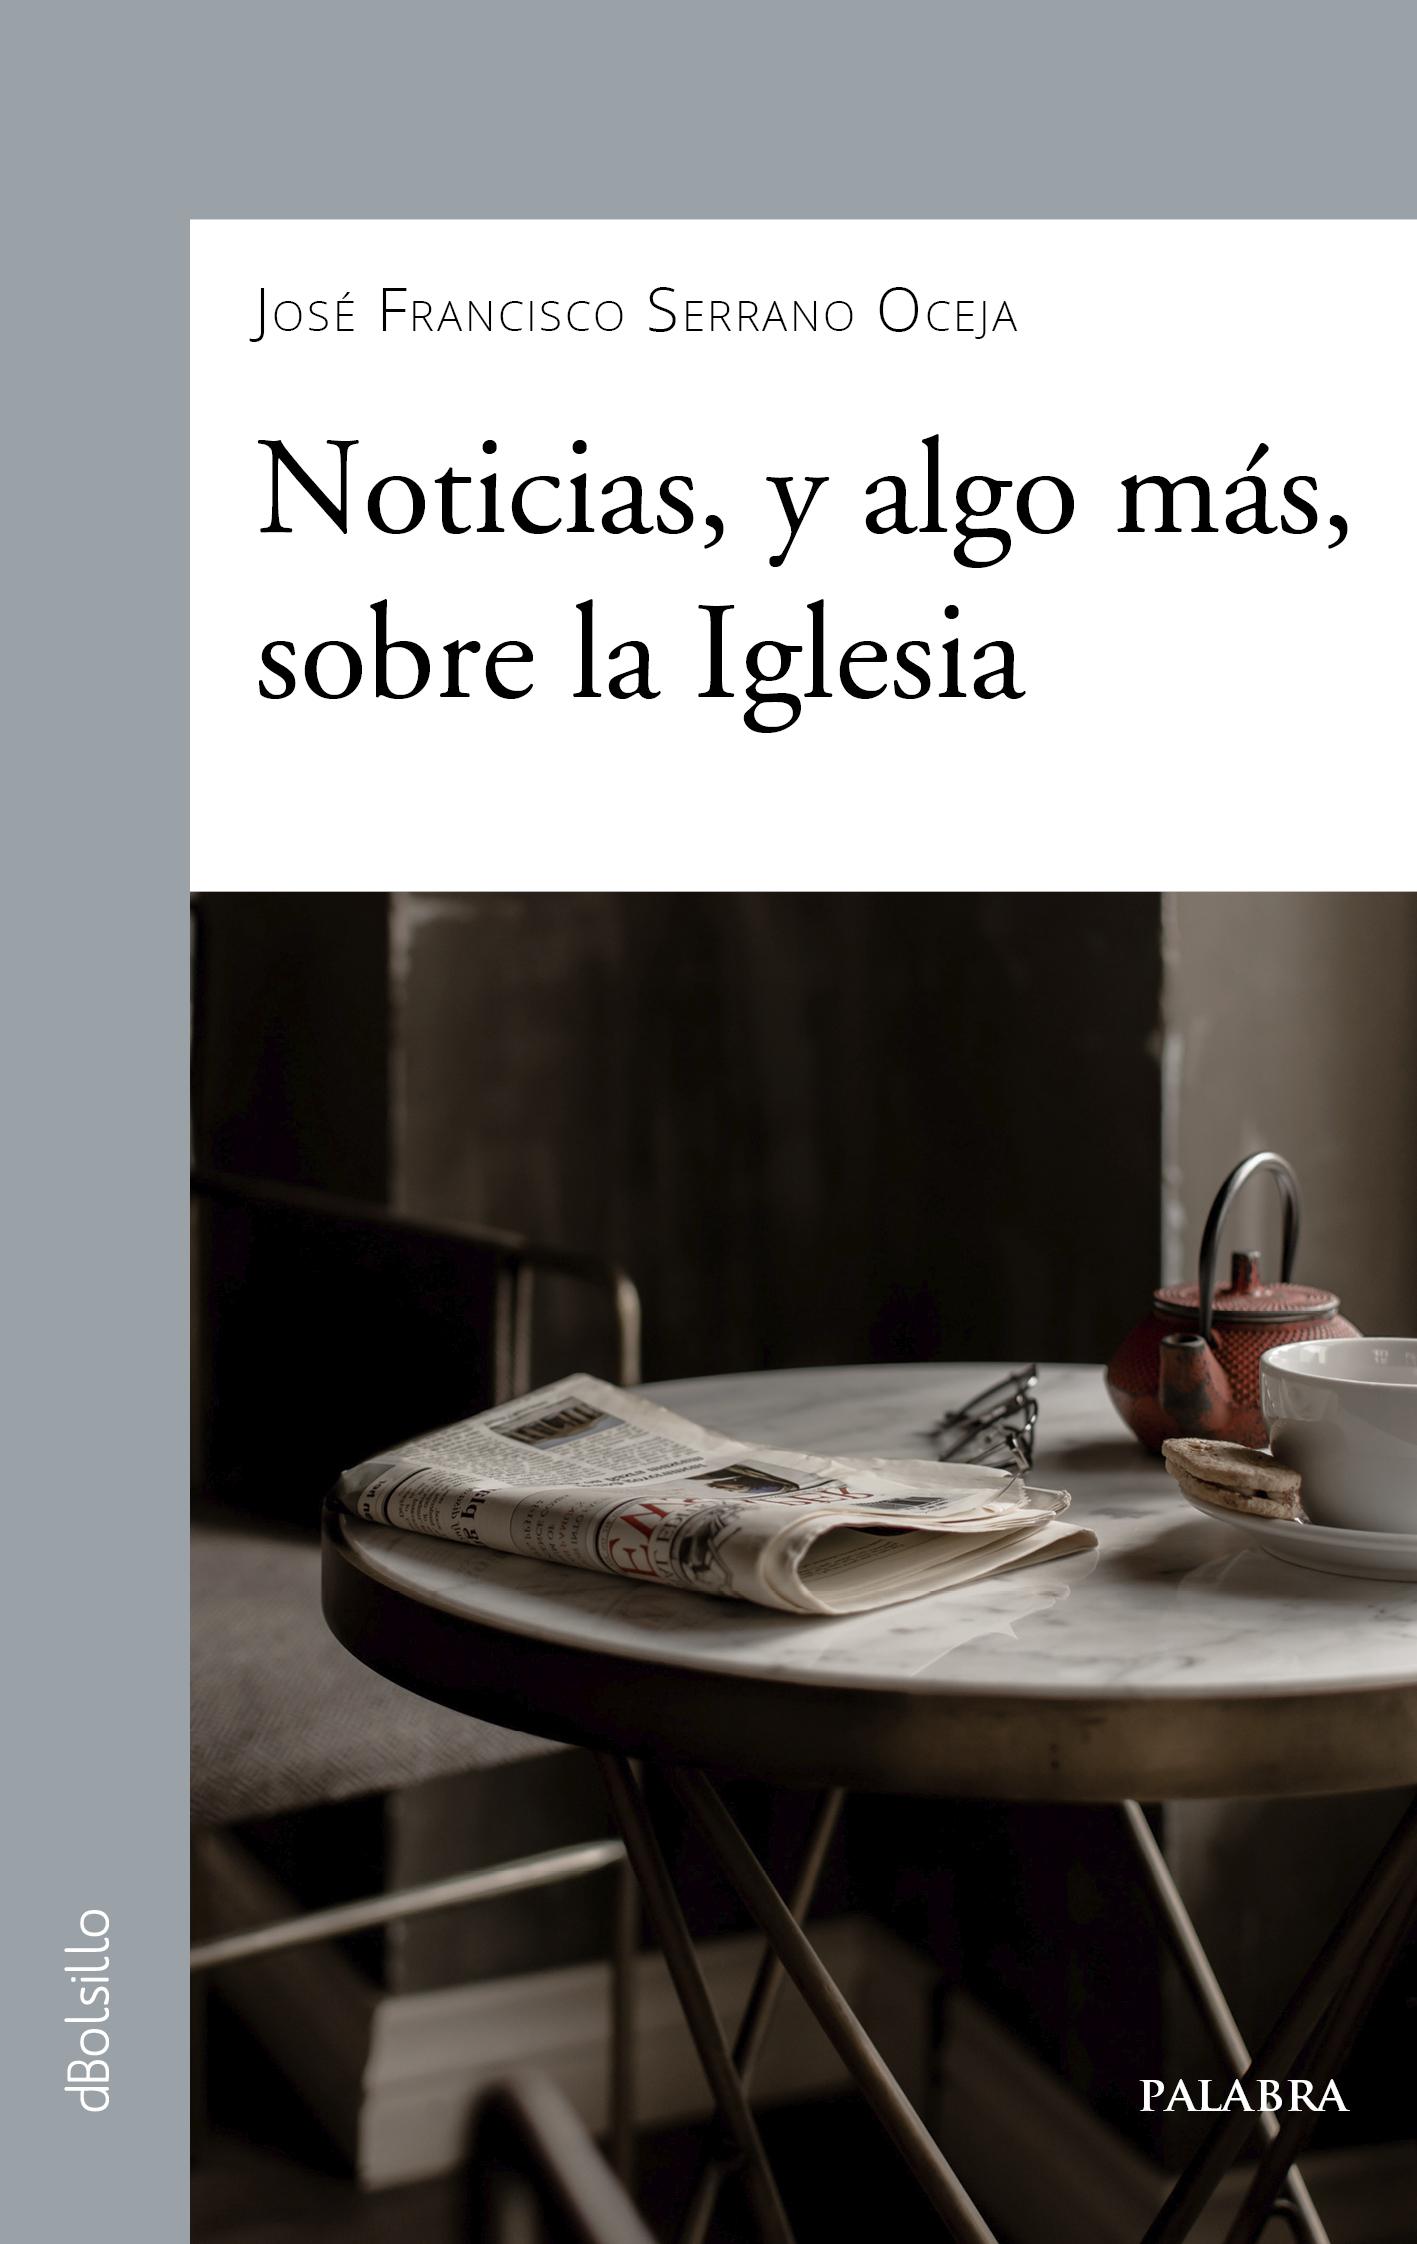 Libro de Serrano Oceja